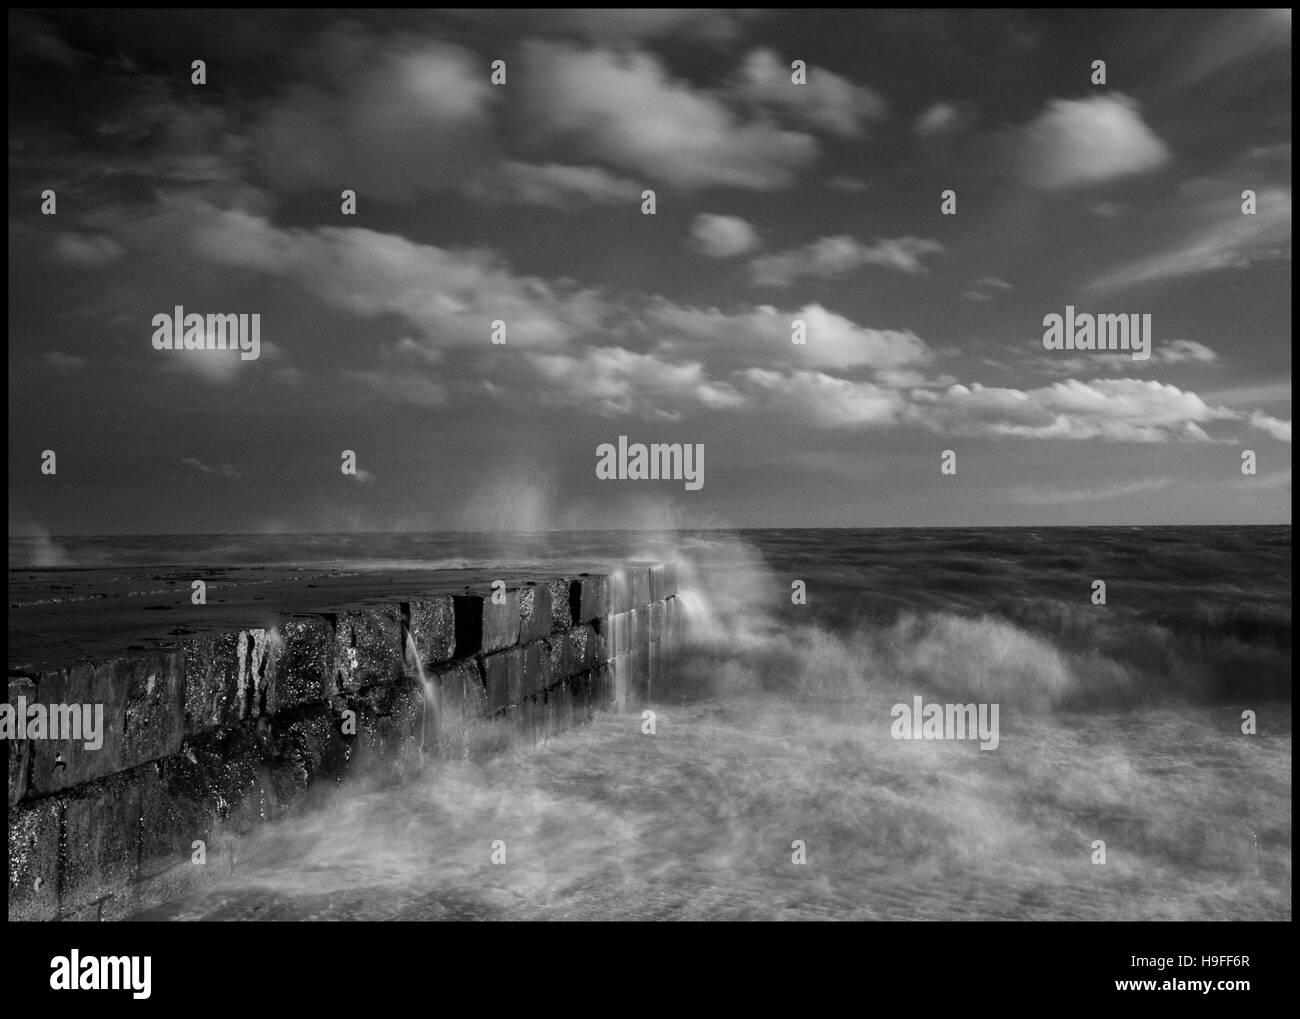 Waves break over the apron at Folkestone Warren, Kent. - Stock Image